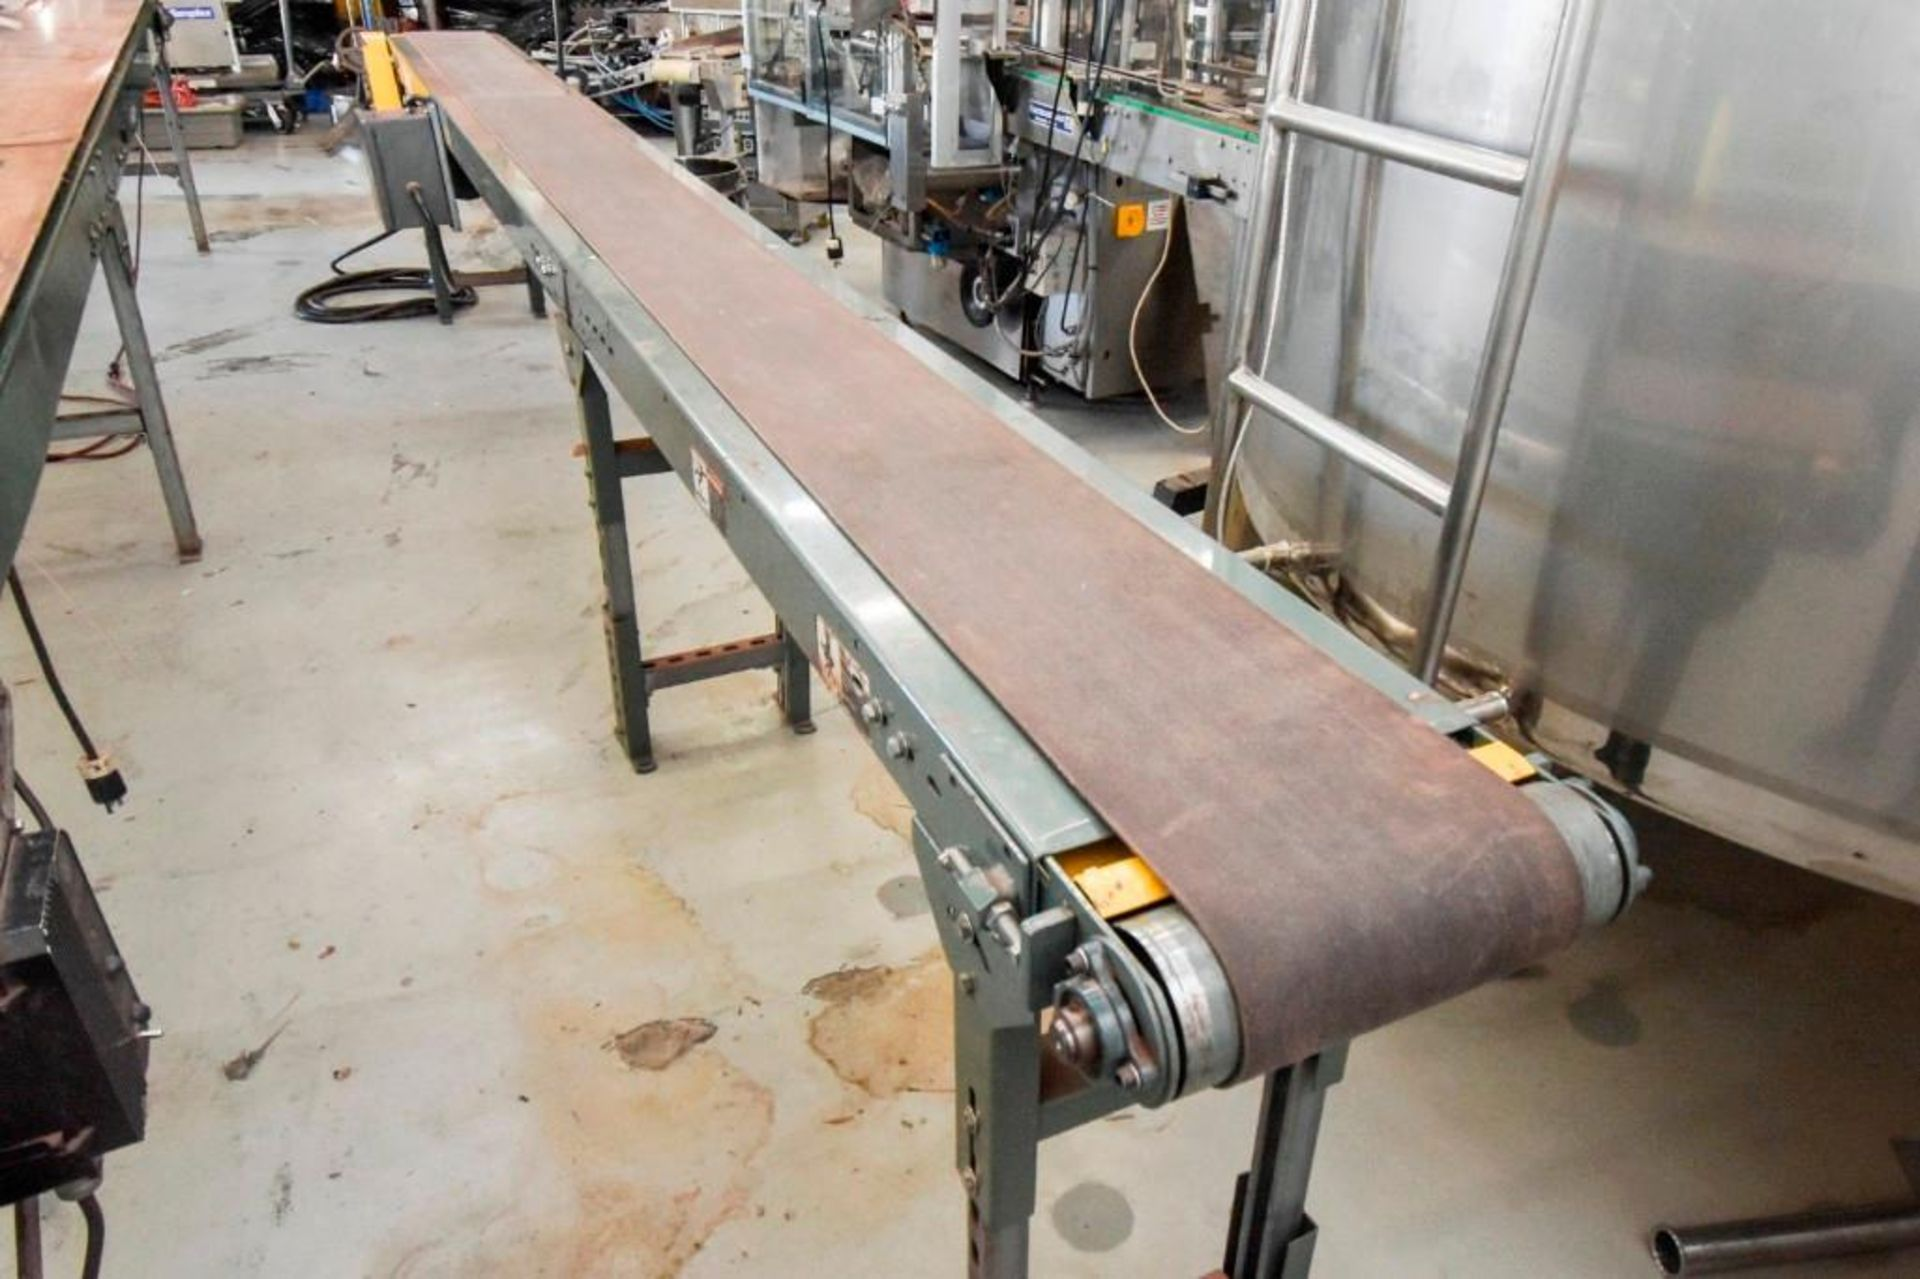 Hytrol Conveyor - Image 5 of 10